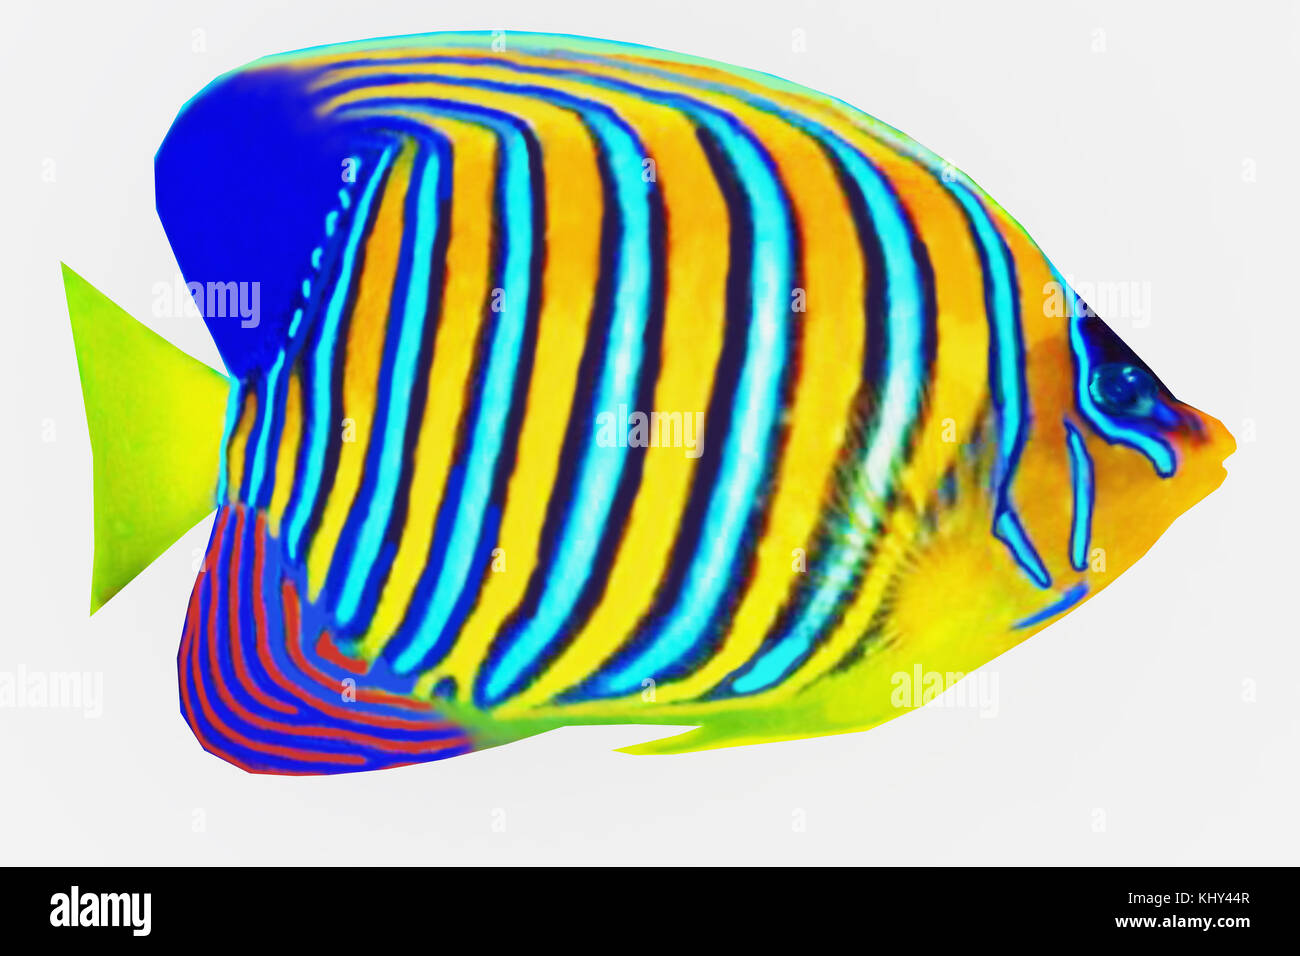 Regal Angelfish - The Regal Angelfish is a saltwater species reef fish in tropical regions of Indo-Pacific oceans. - Stock Image